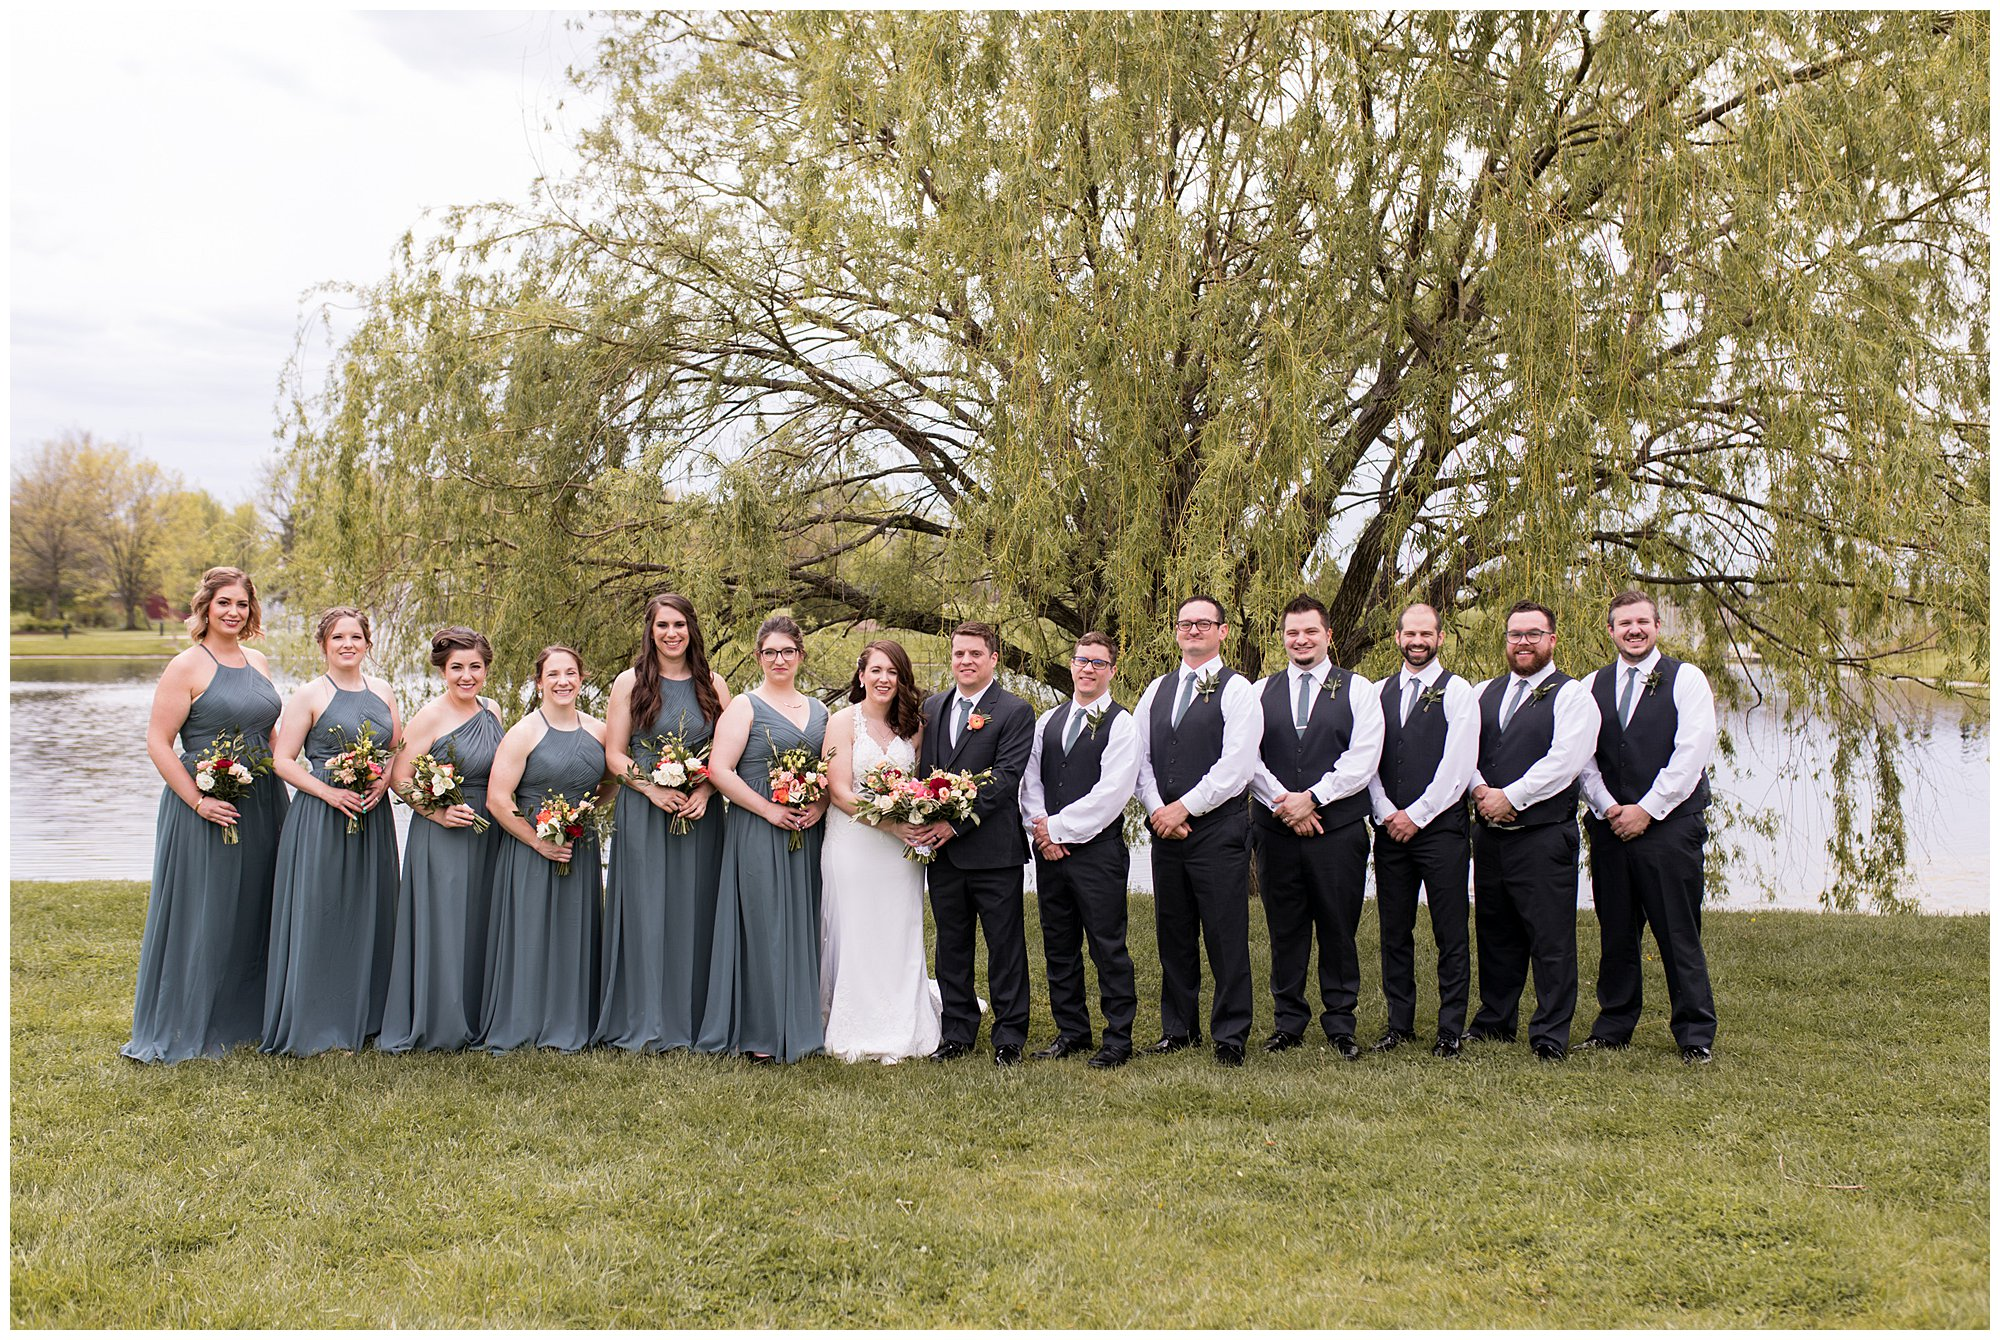 wedding party photos at Coxhall Gardens in Carmel